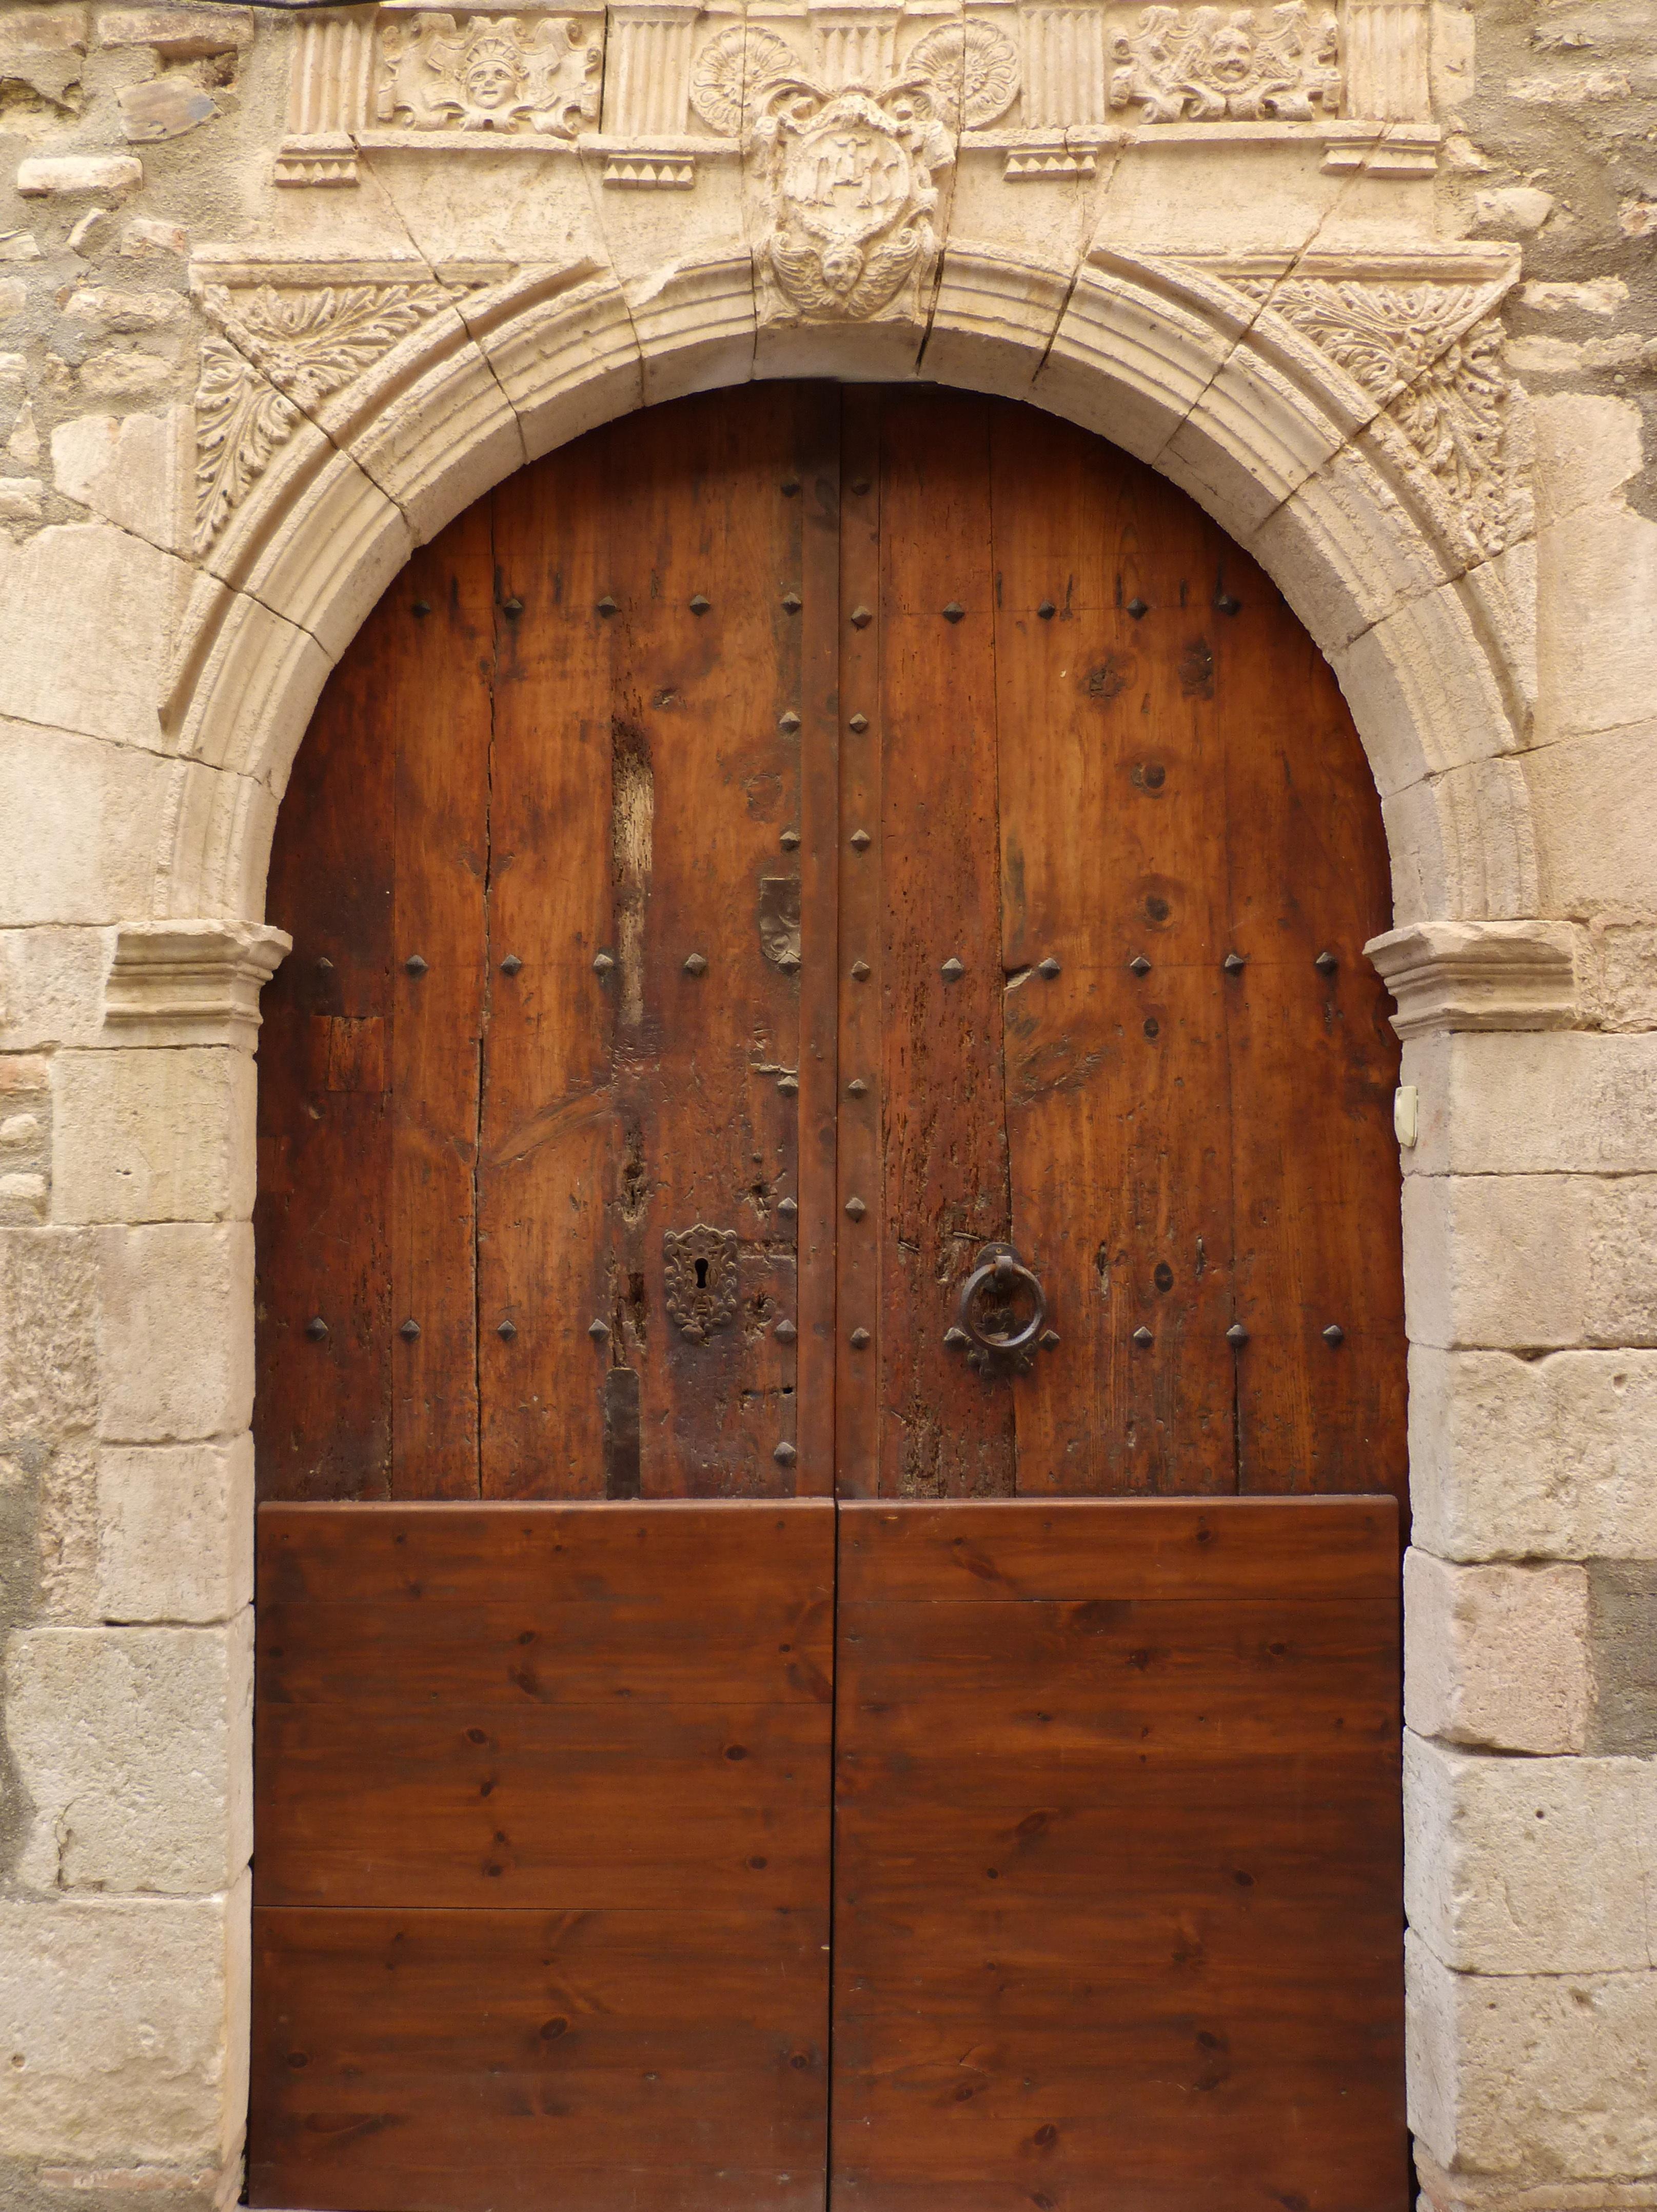 Fotos gratis arquitectura madera antiguo arco mueble for Arcos de madera para puertas